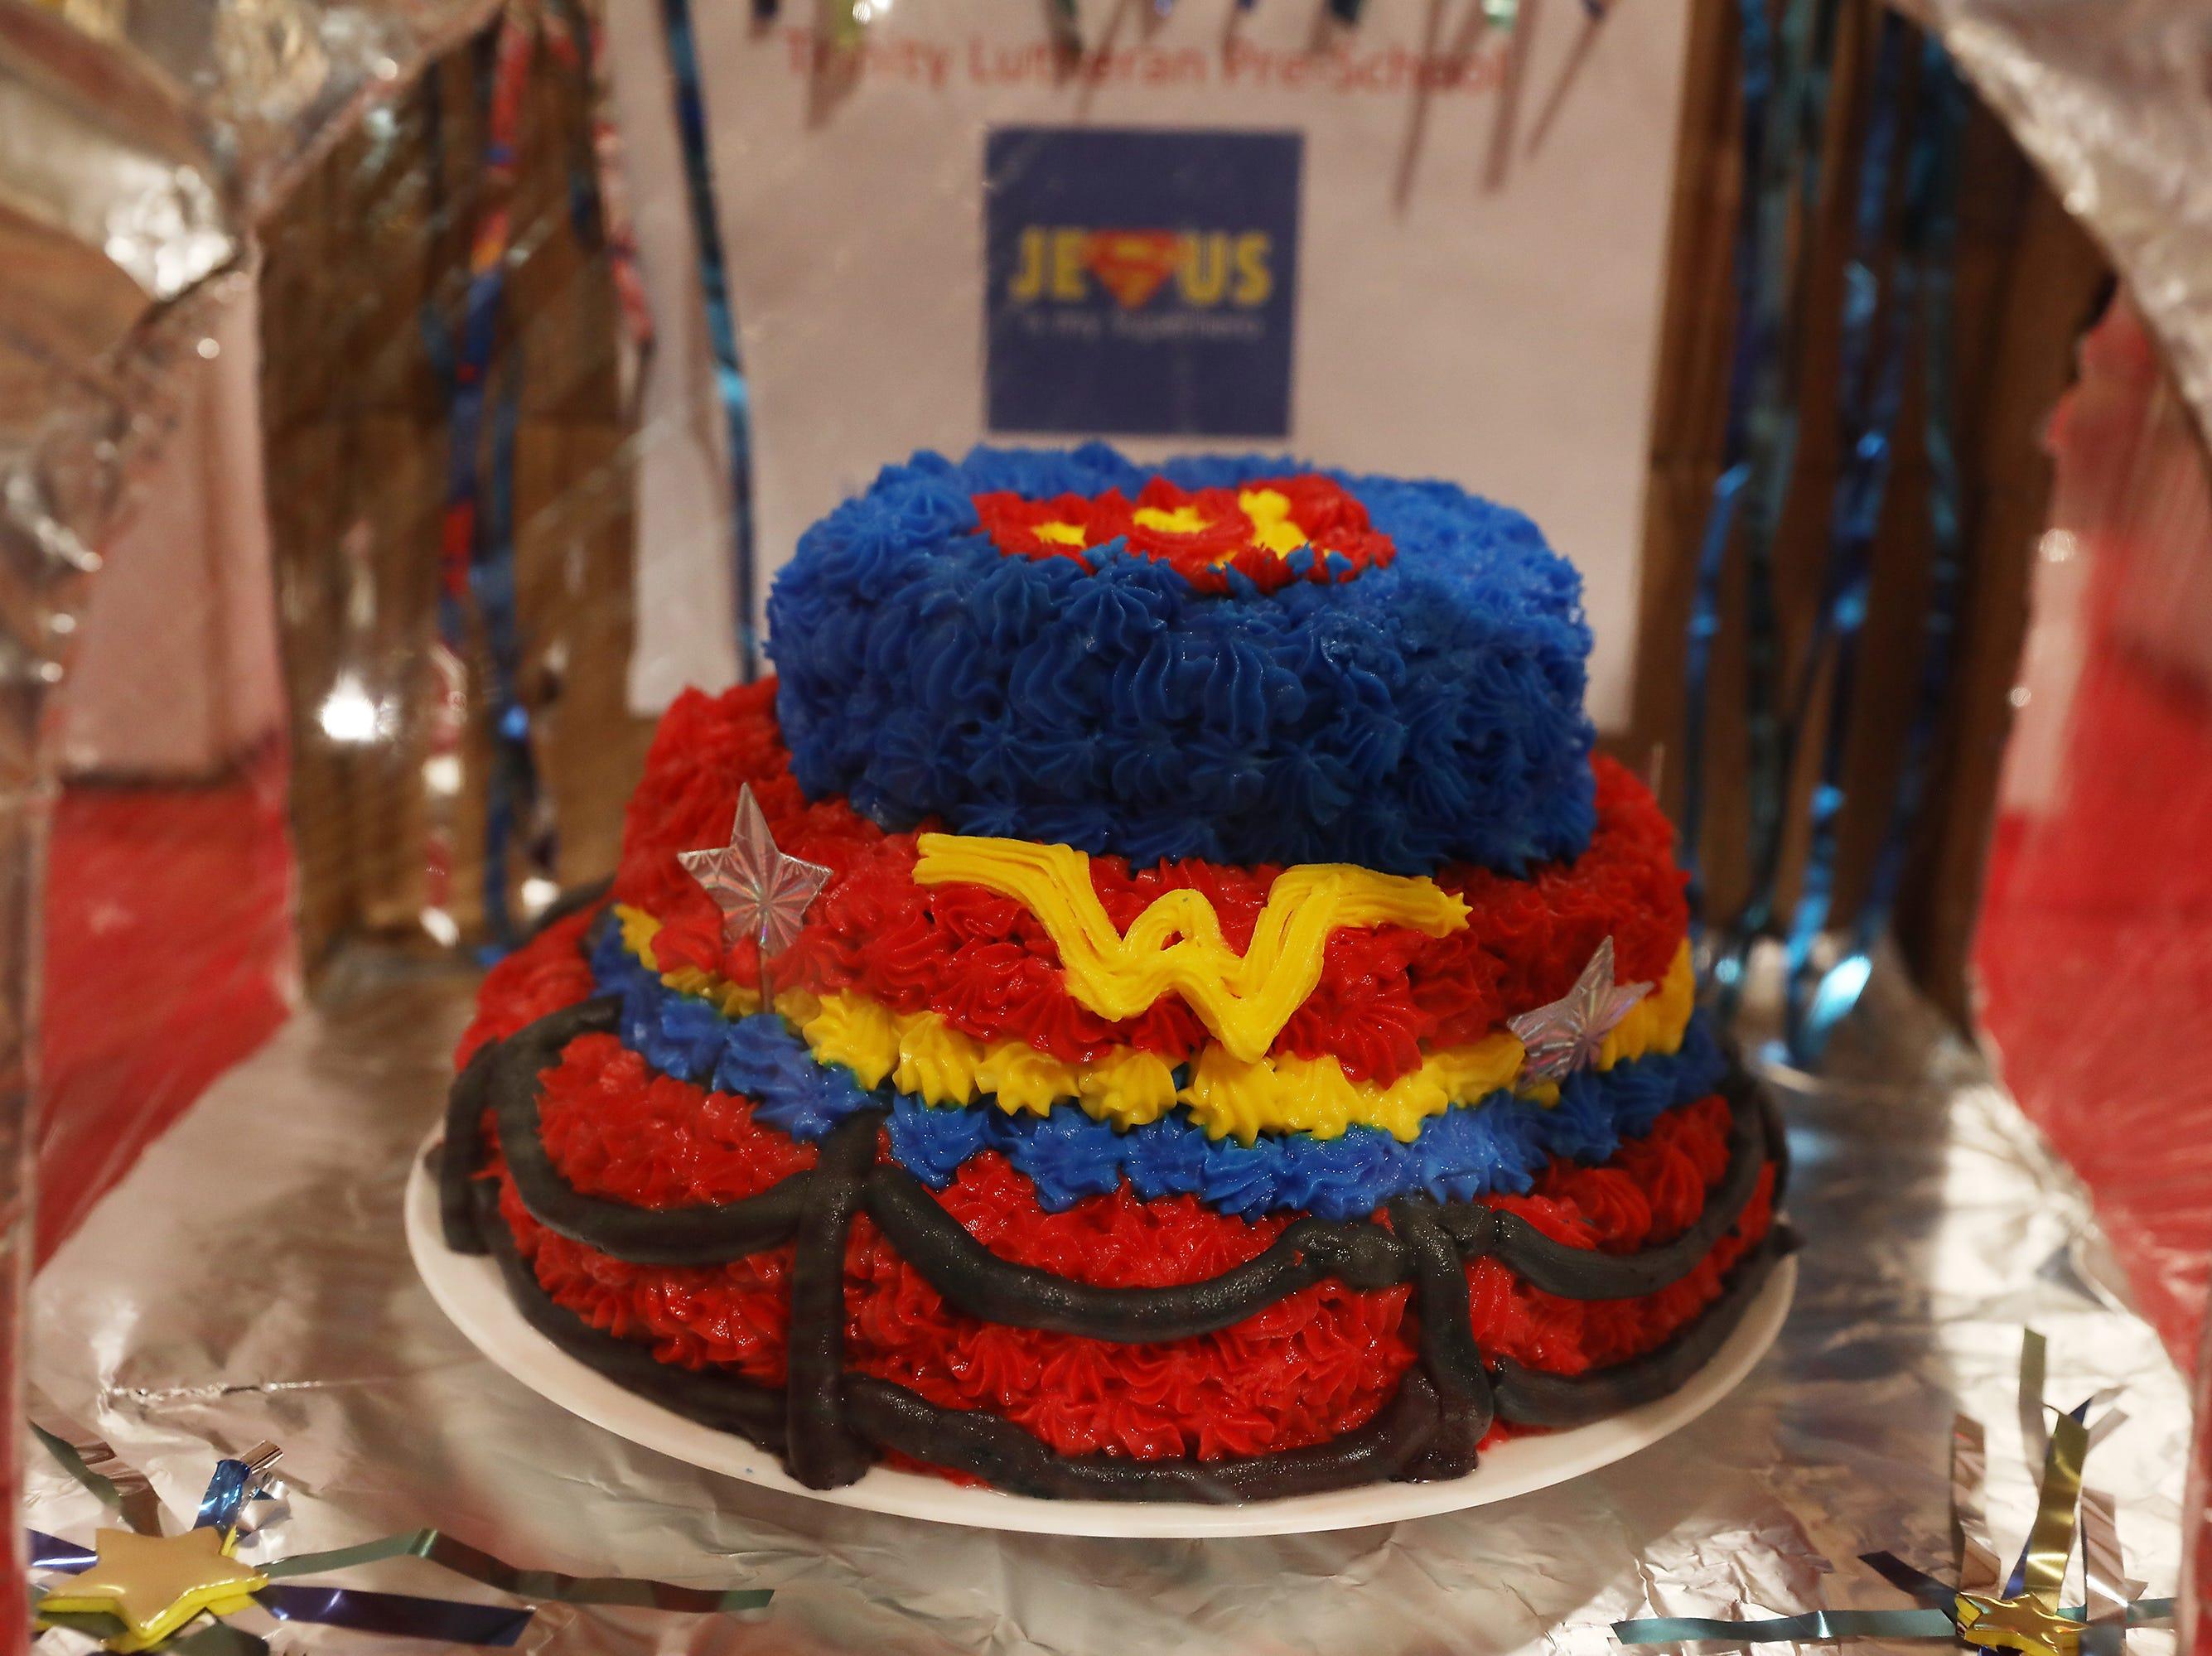 12:45 P.M. Thursday cake 91 Trinity Lutheran Church and Preschool - 2 Christian super hero print sets; $100